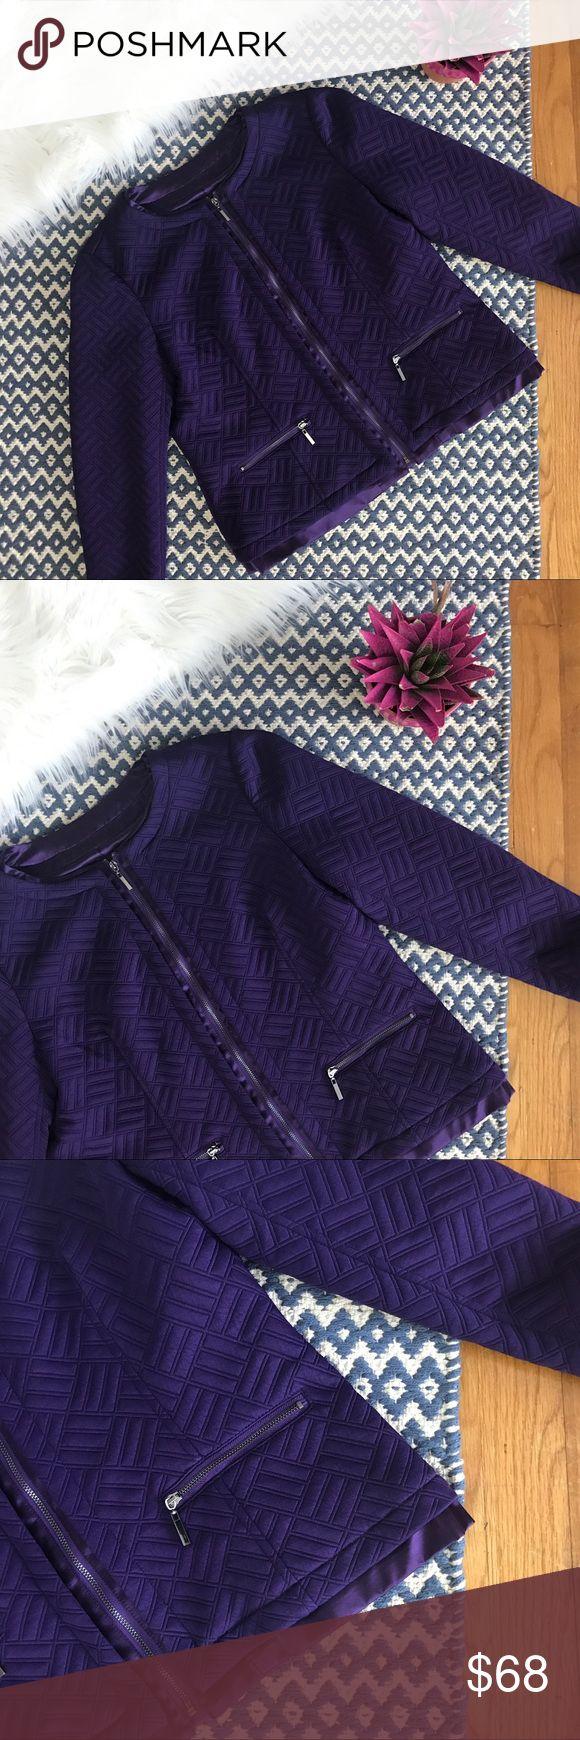 Laura Ashley Purple Quilted Blazer NWT A Laura Ashley Jackets & Coats Blazers